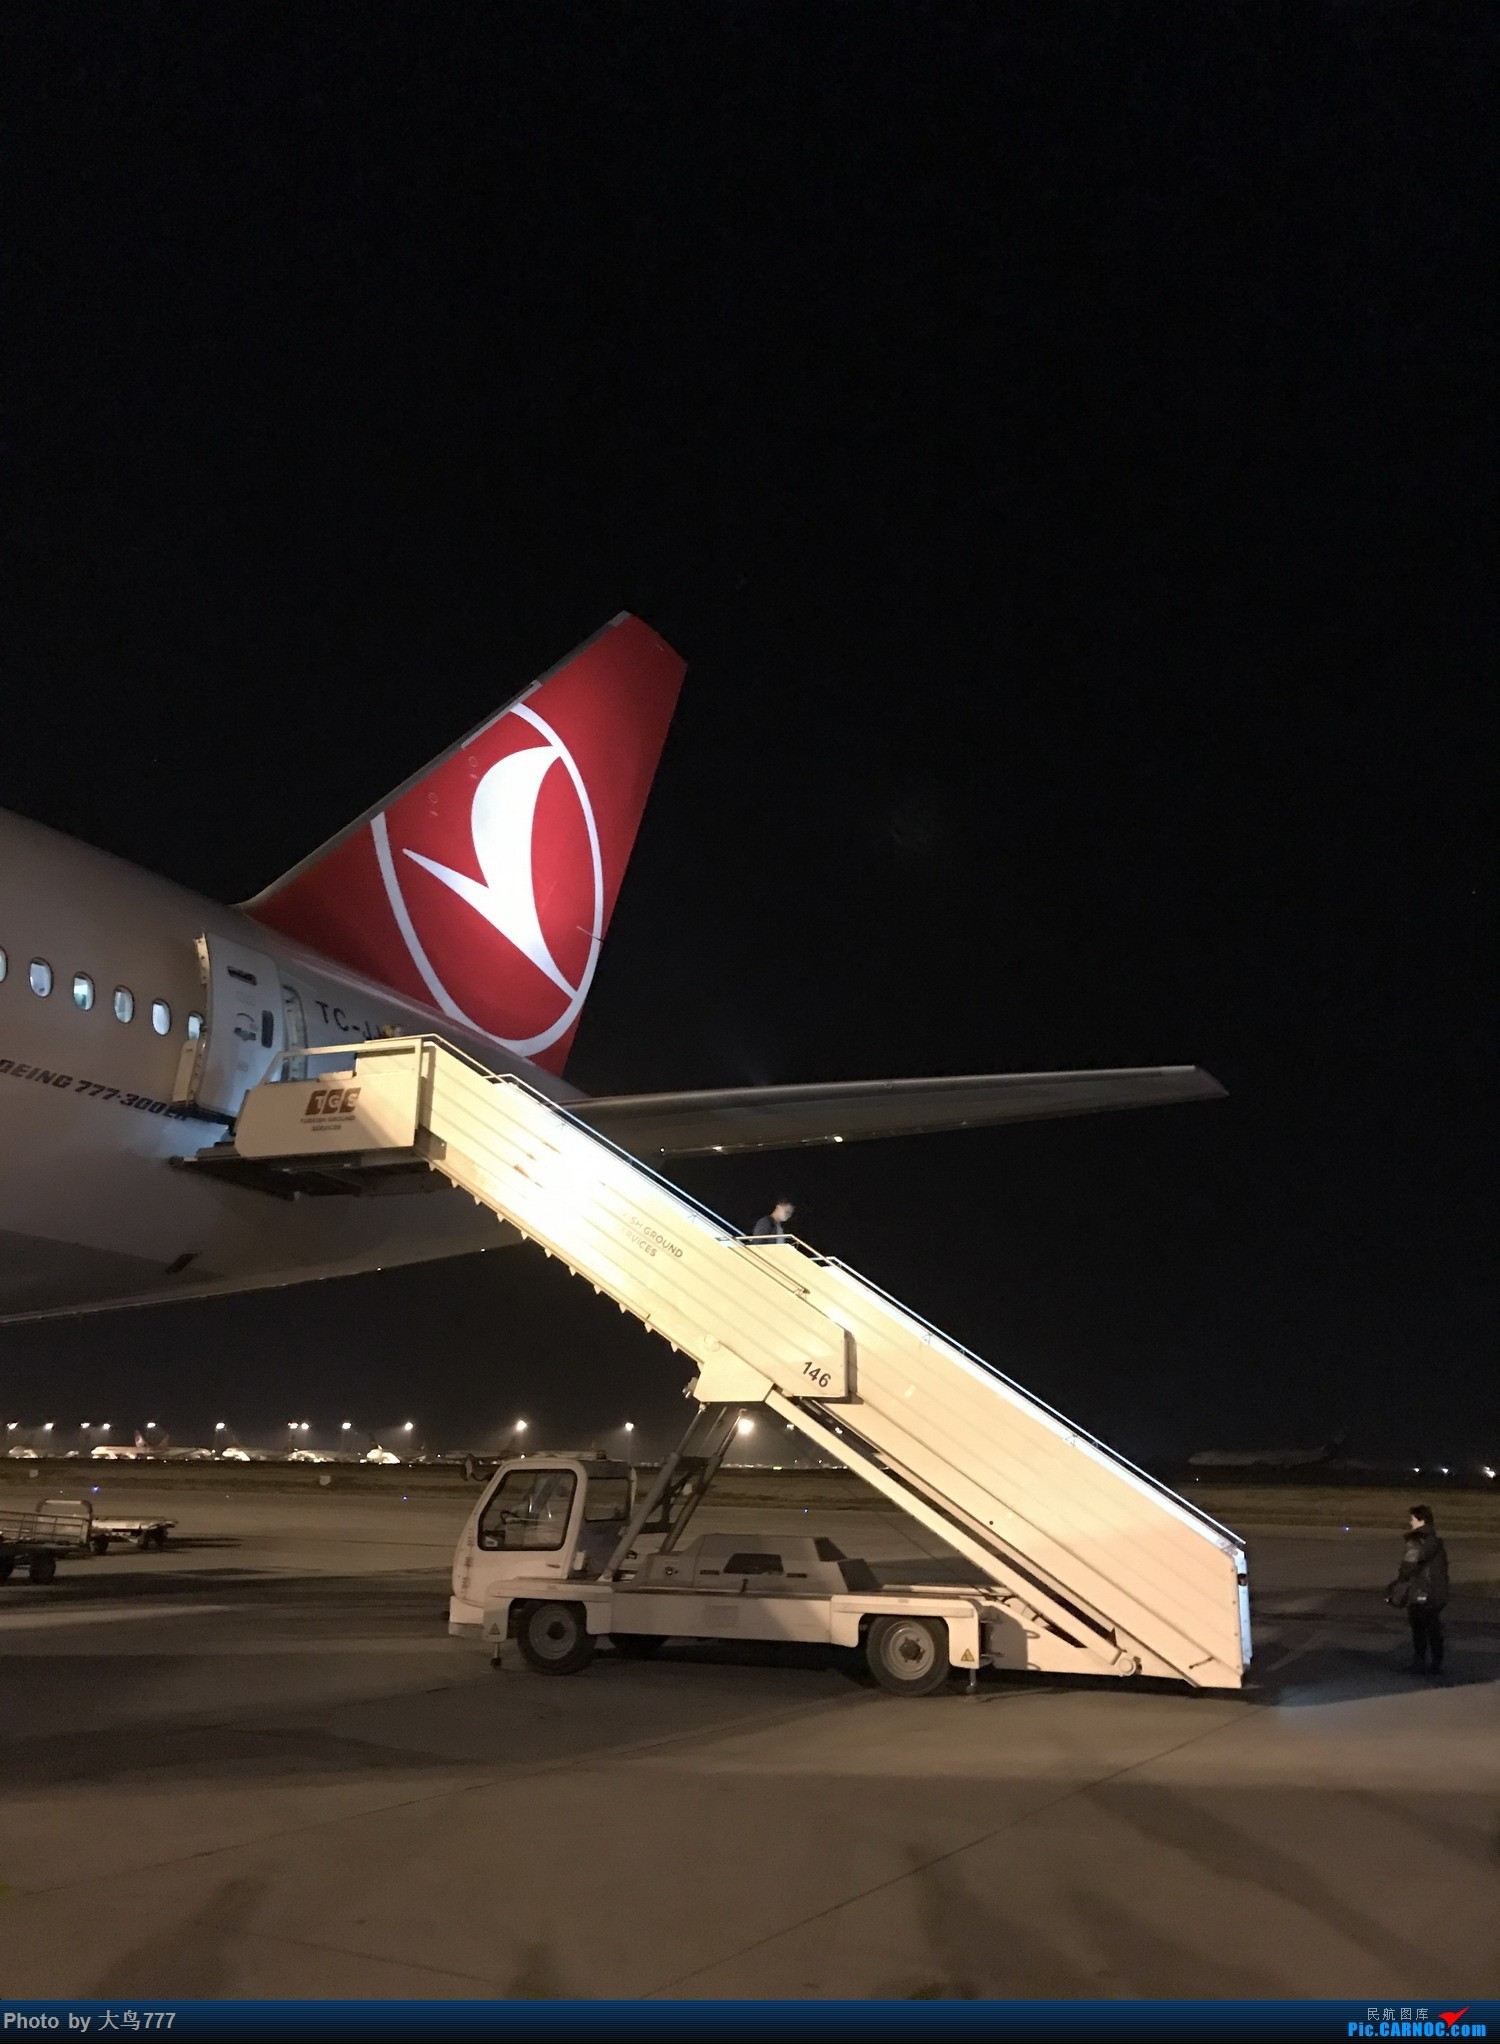 Re:[原创]再次感受欧洲最佳——土耳其航空(回程被坑晚点4个多小时) BOEING 777-300ER